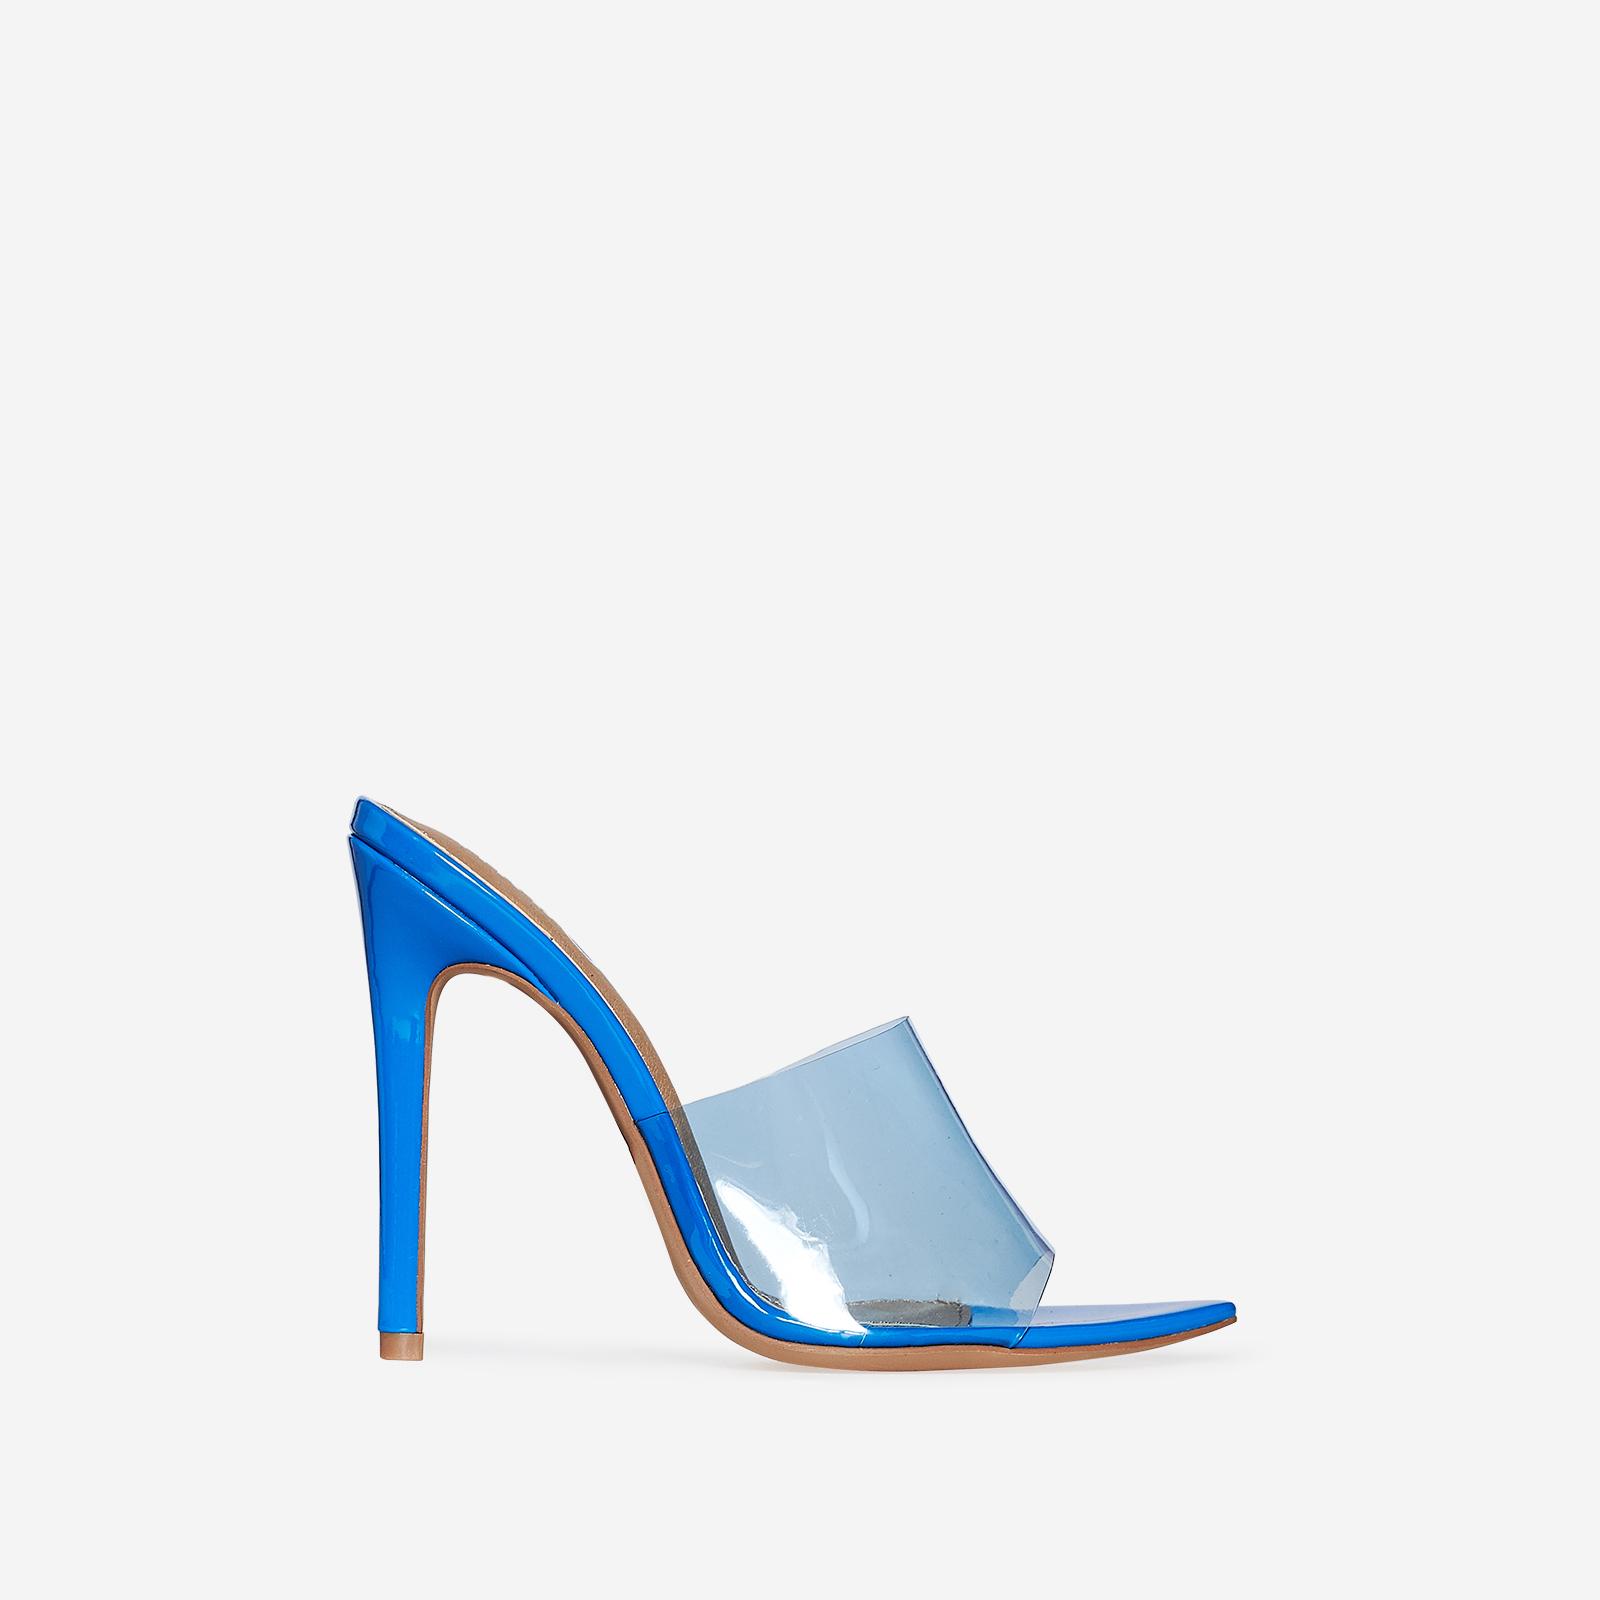 Kilo Perspex Peep Toe Mule In Blue Patent